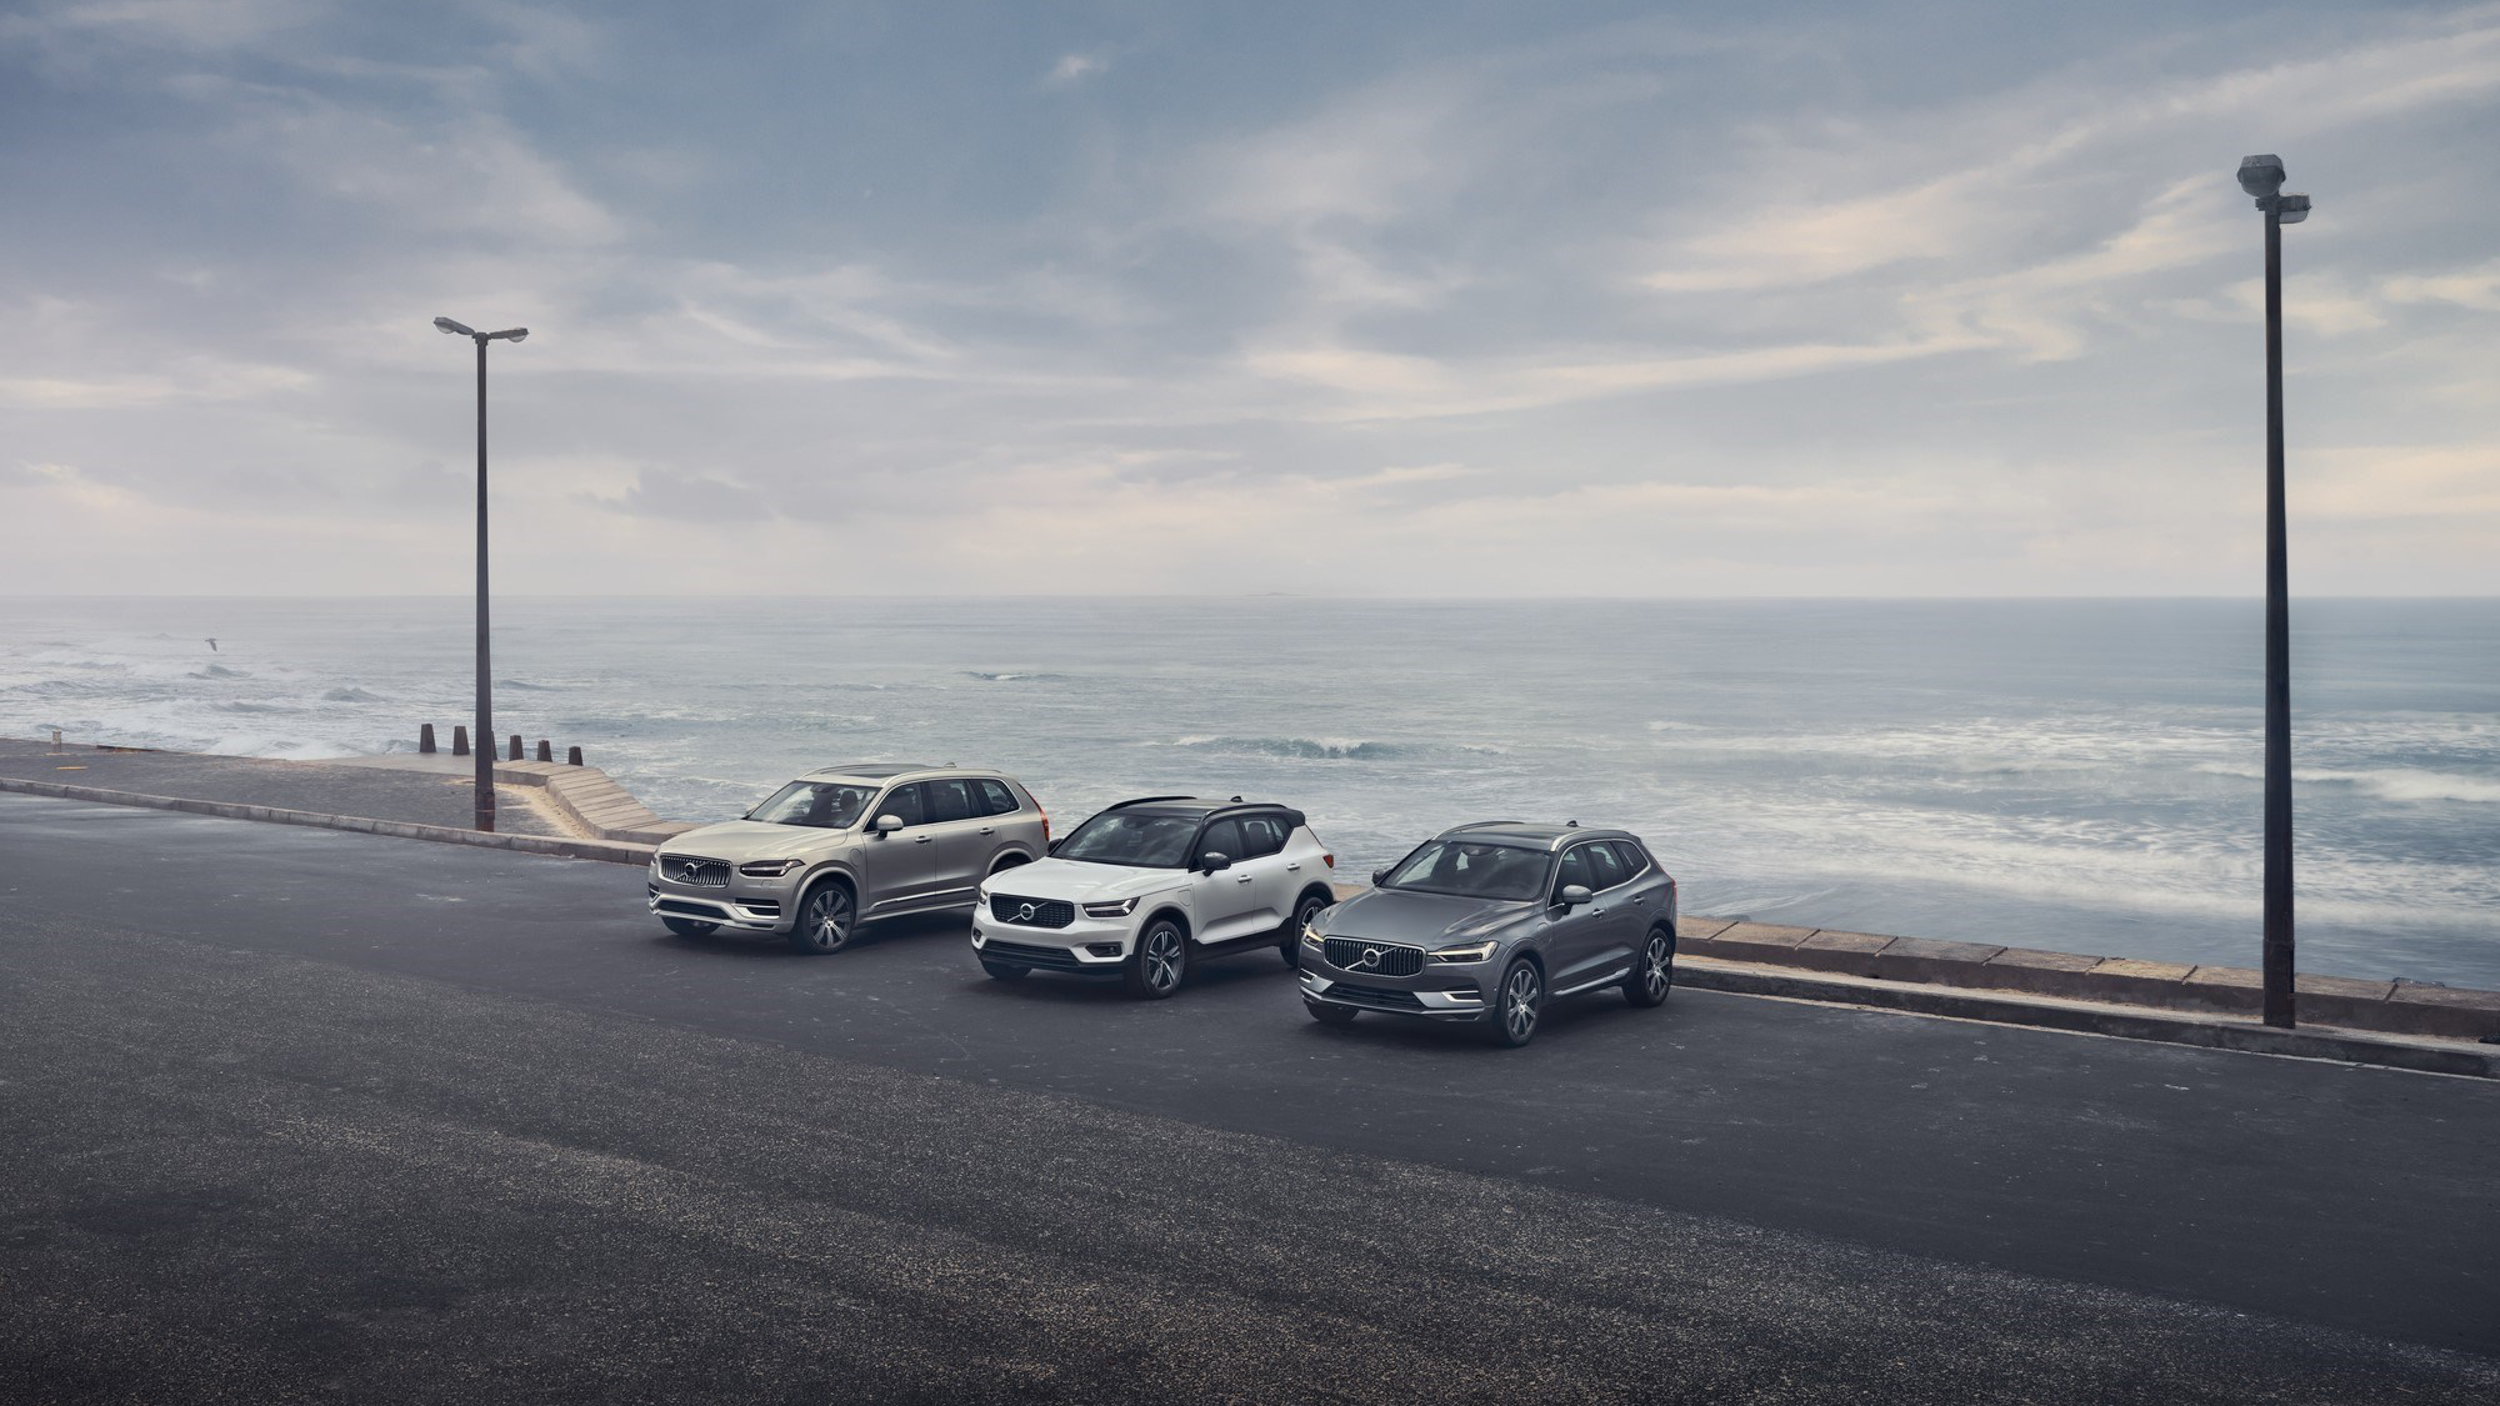 ▲ Volvo 銷售創新高!9 月成長率 25.99% 勇冠所有豪華品牌